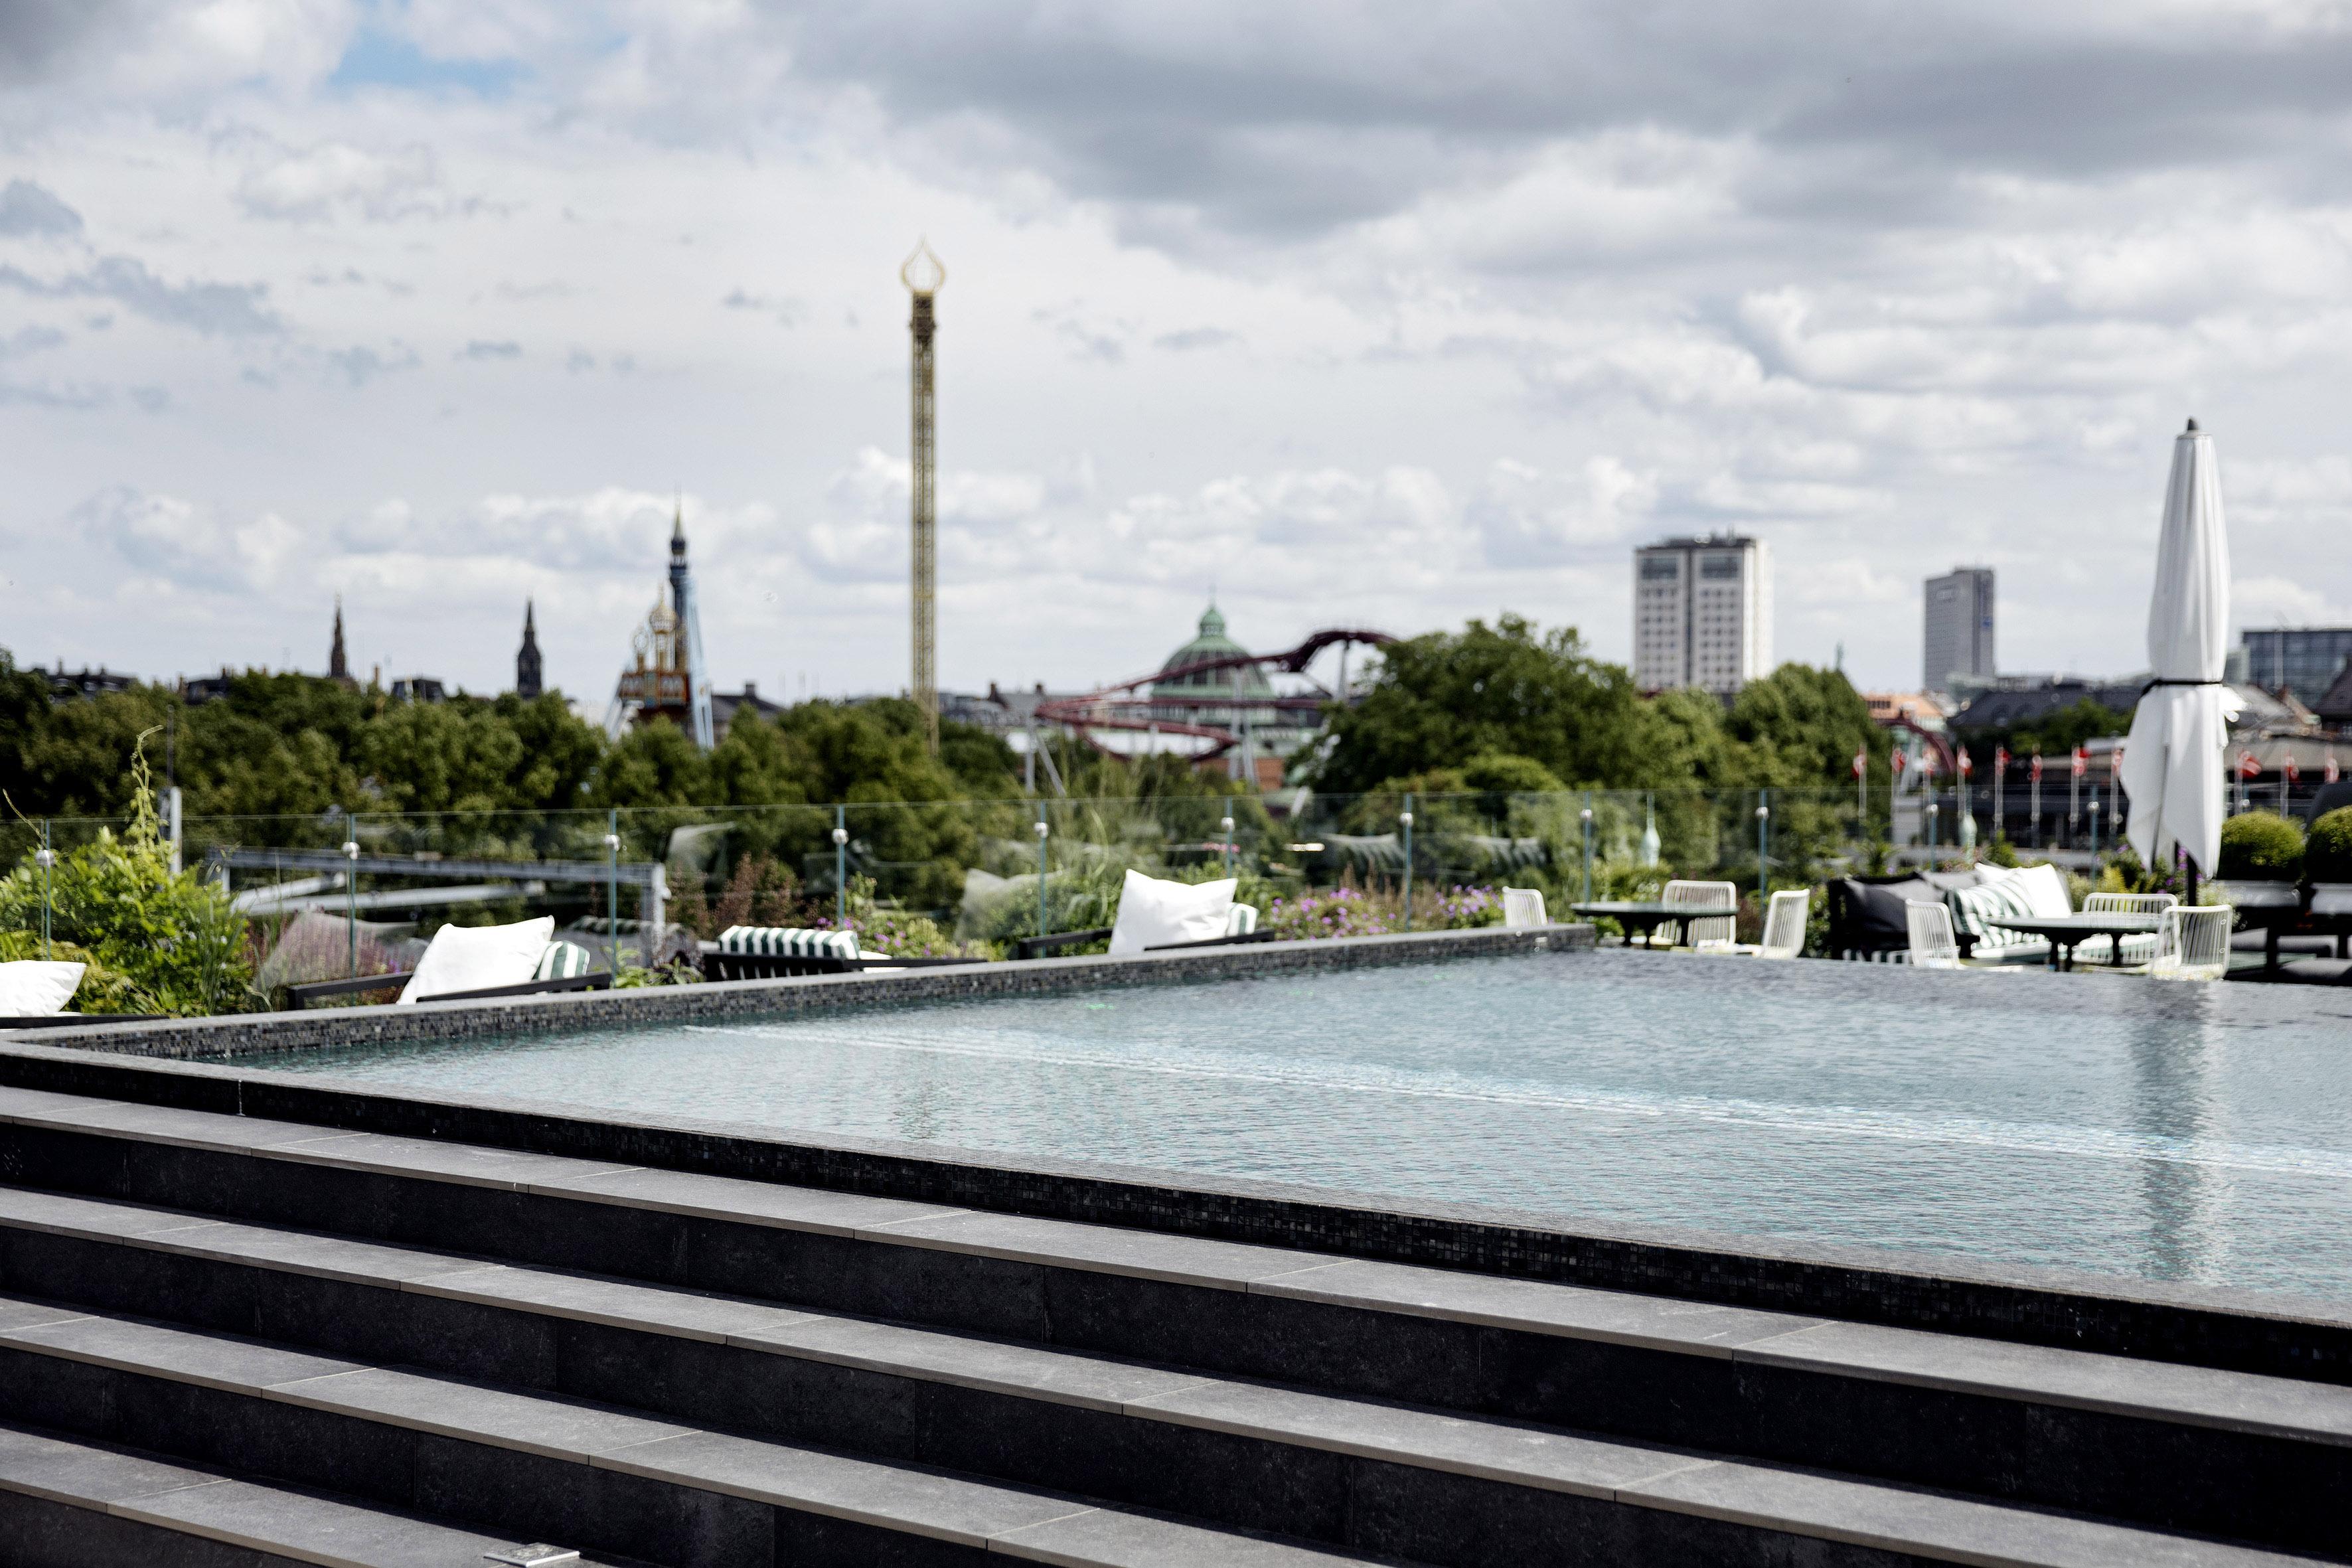 Et kig udover bassinet på nyåbnede Nimb Roof med Tivoli i baggrunden. Foto: Tivoli.